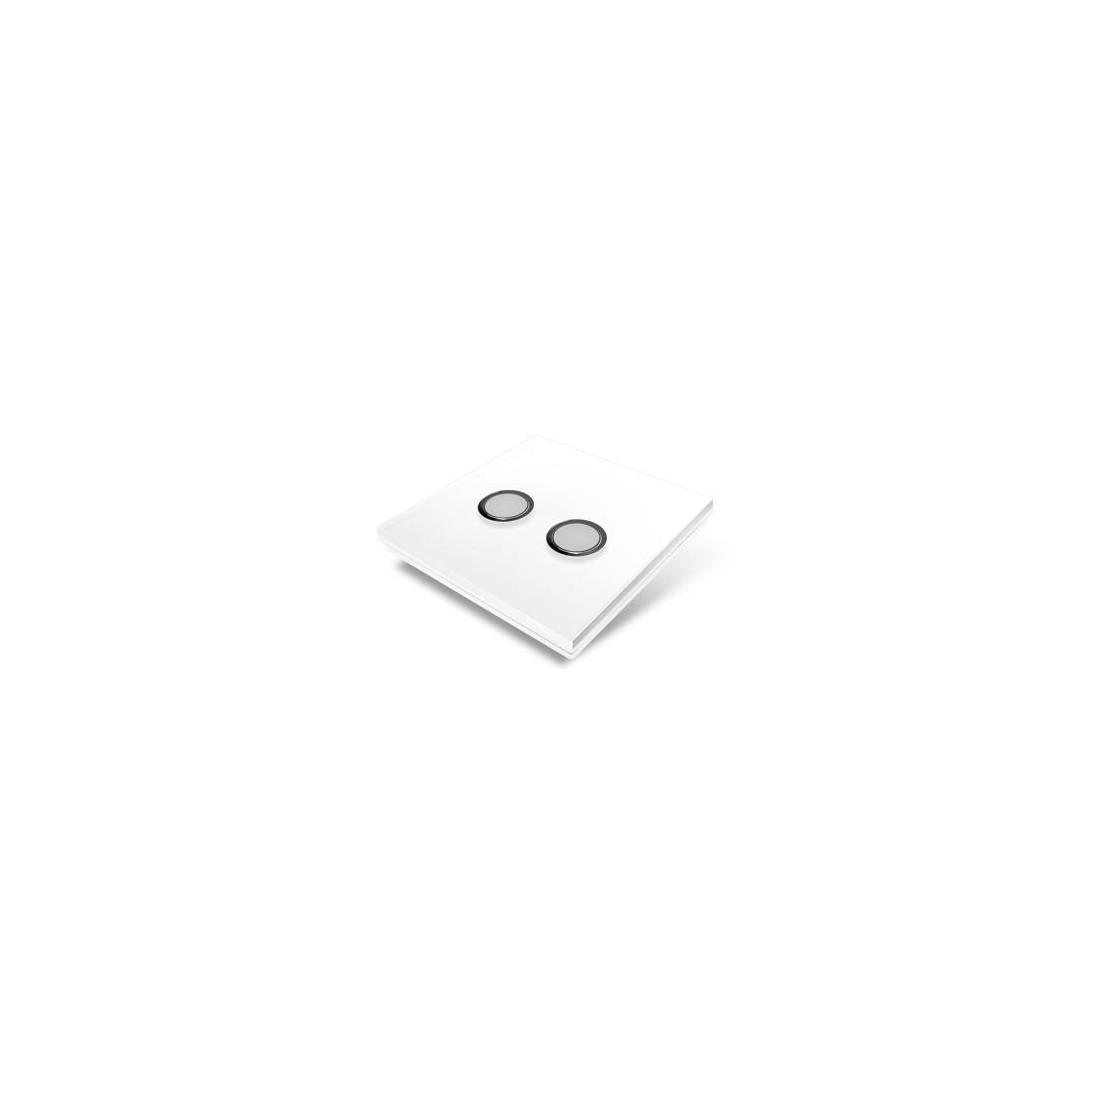 Switchplate for Edisio - white plastic